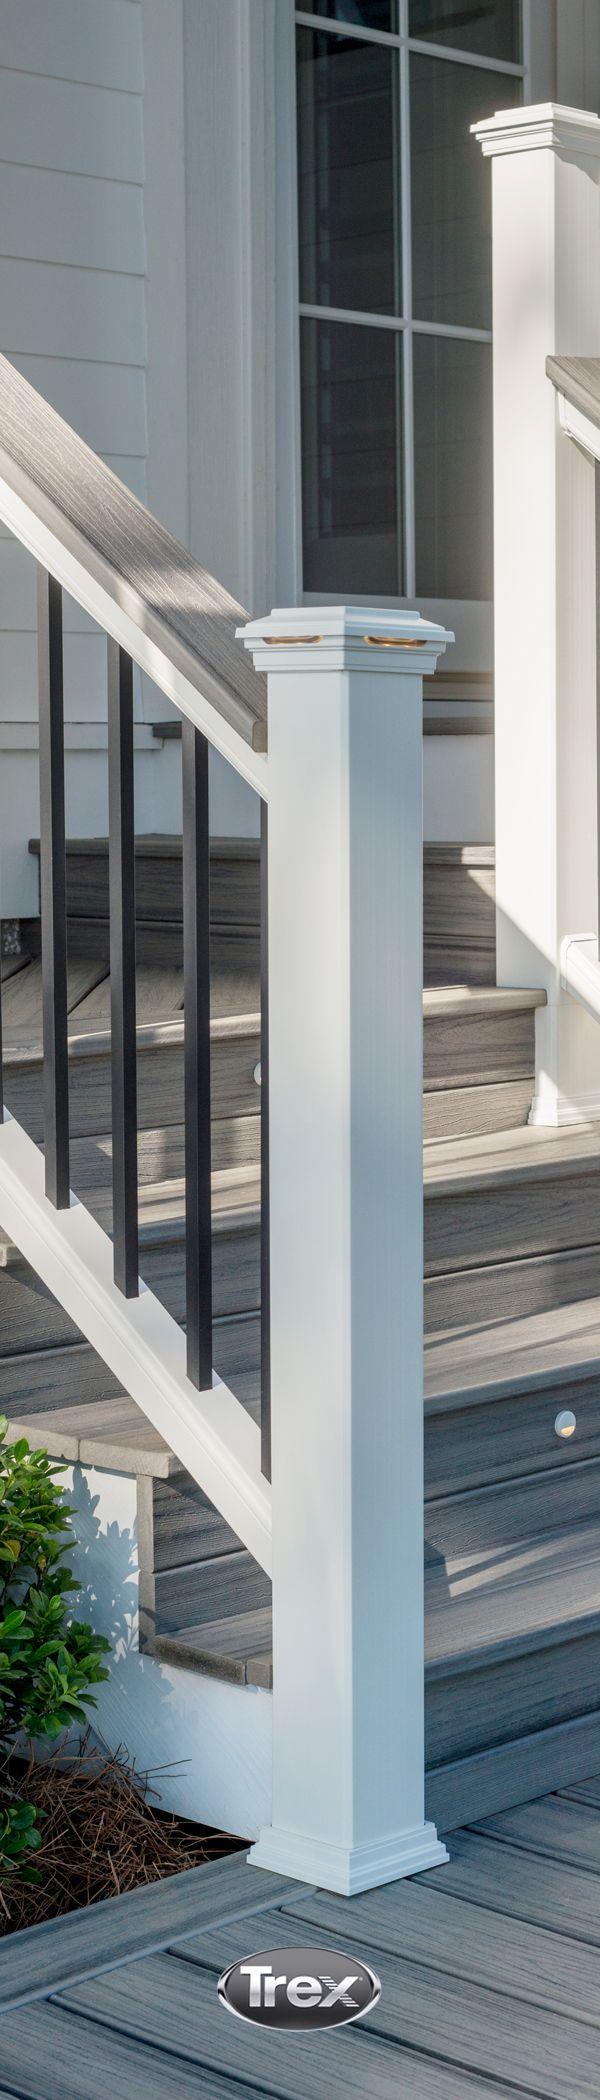 Upper Deck Railing Ideas